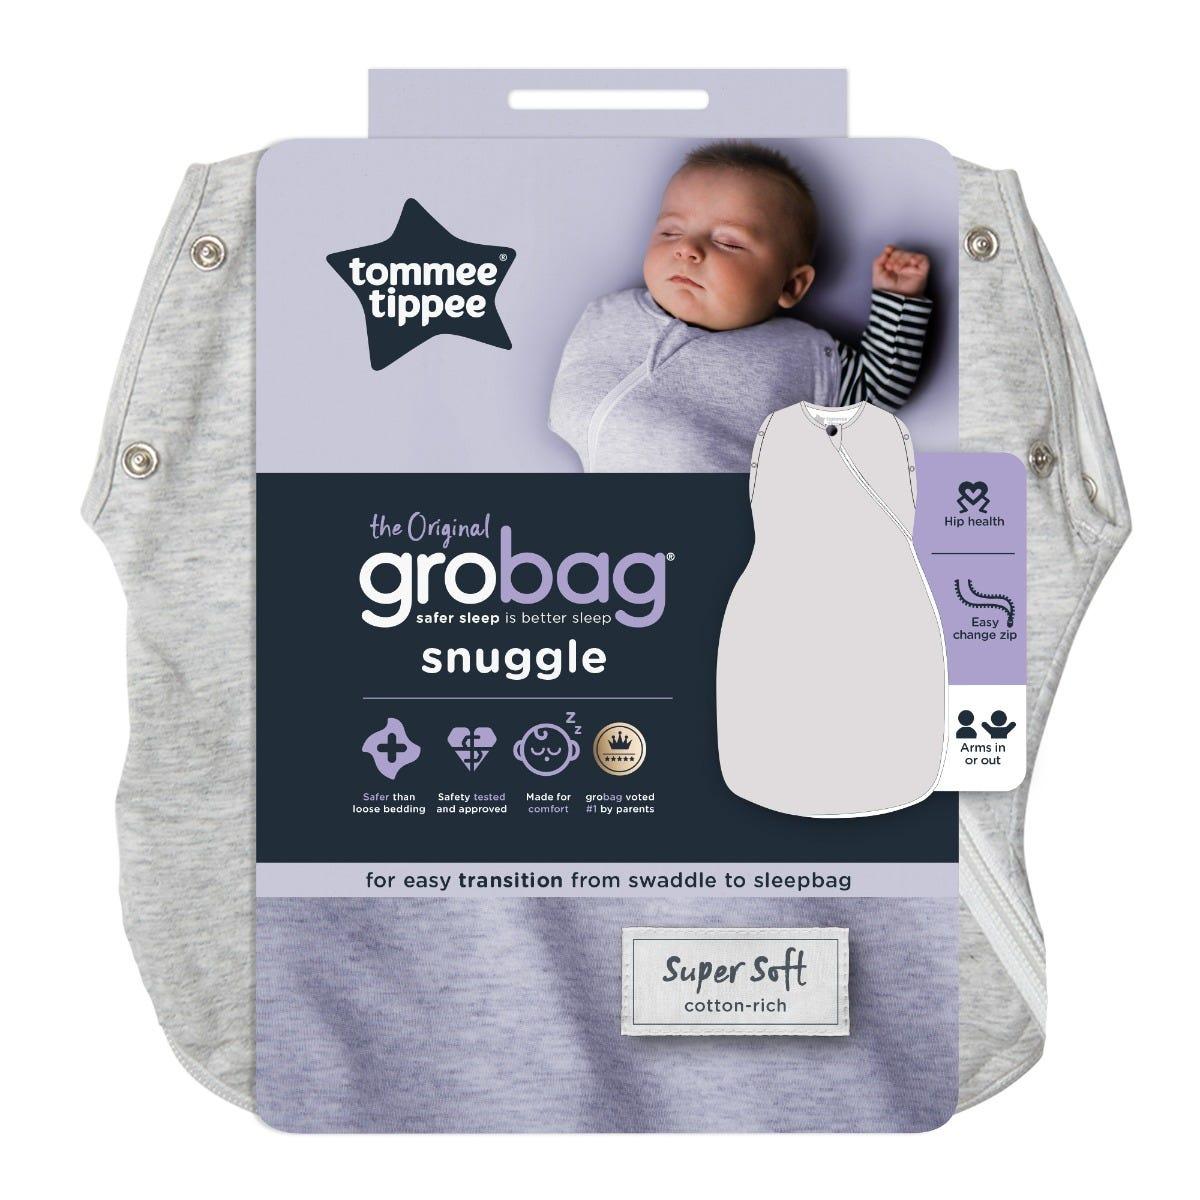 The Original Grobag Grey Marl Snuggle packaging